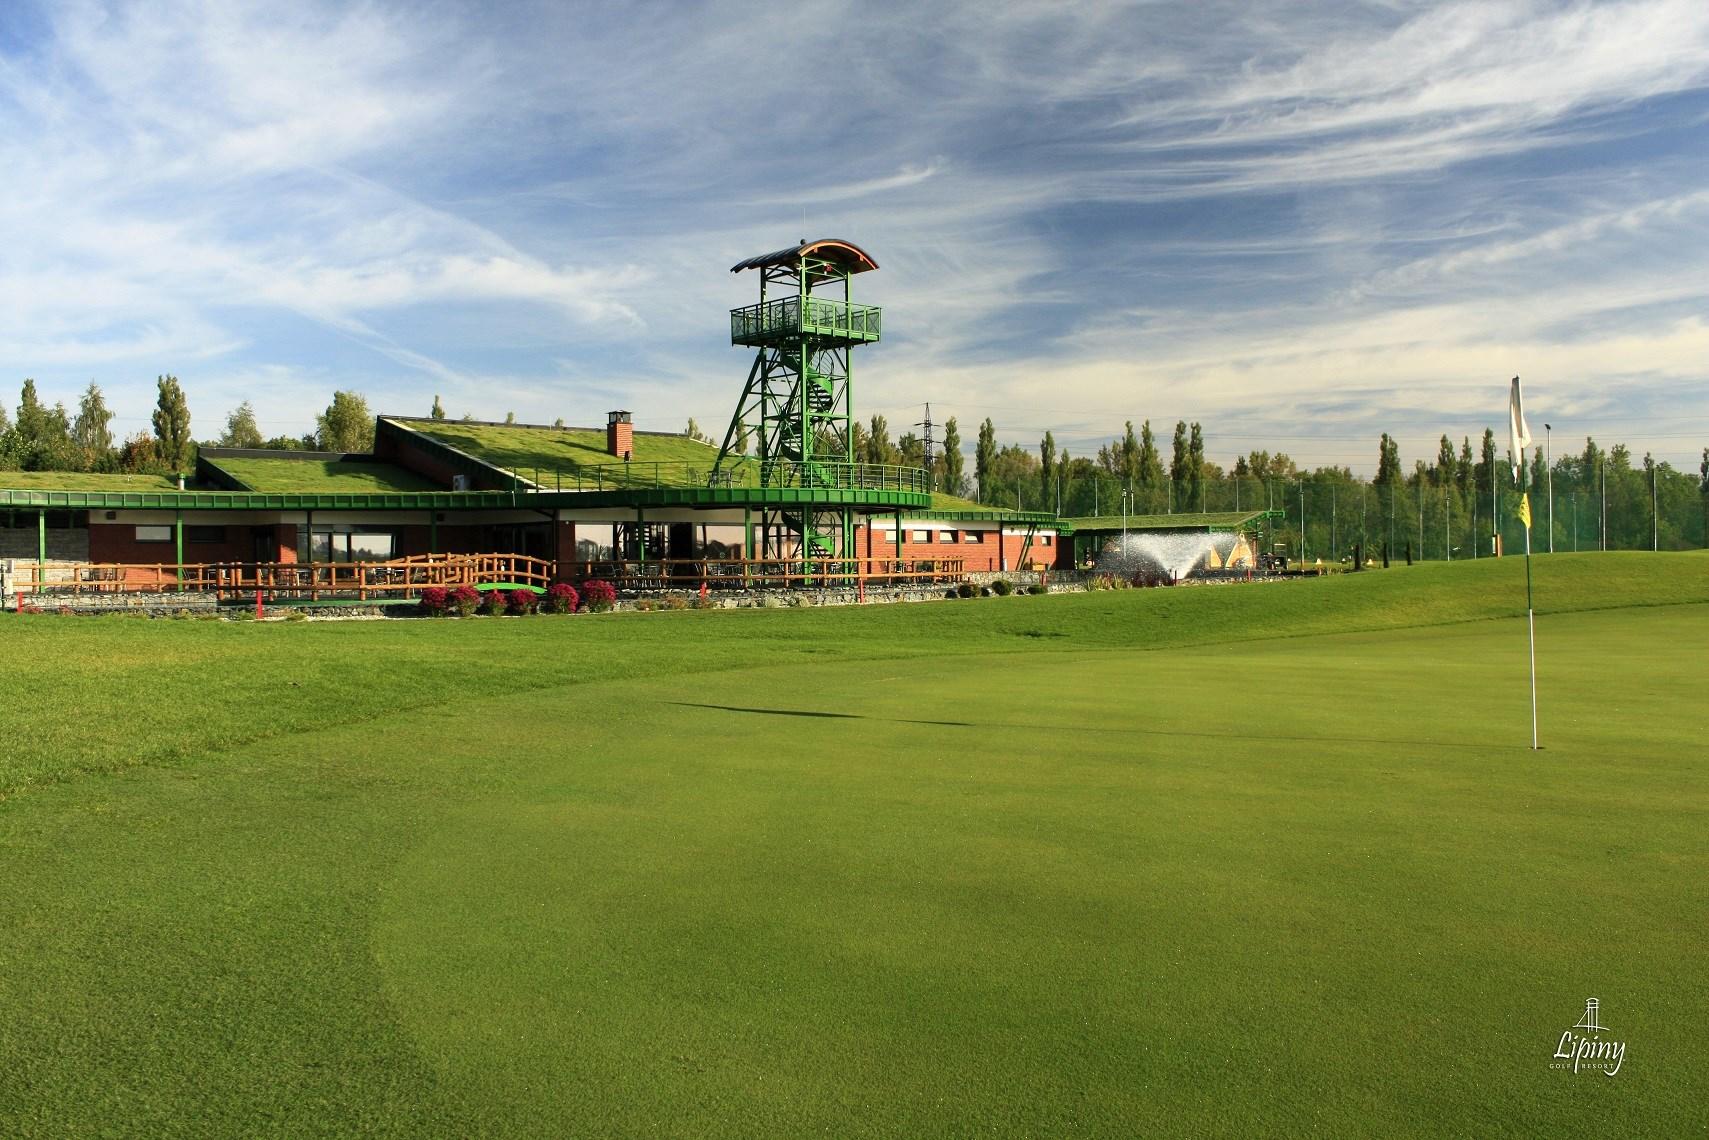 Golf_Lipiny_Karvina_01.jpg